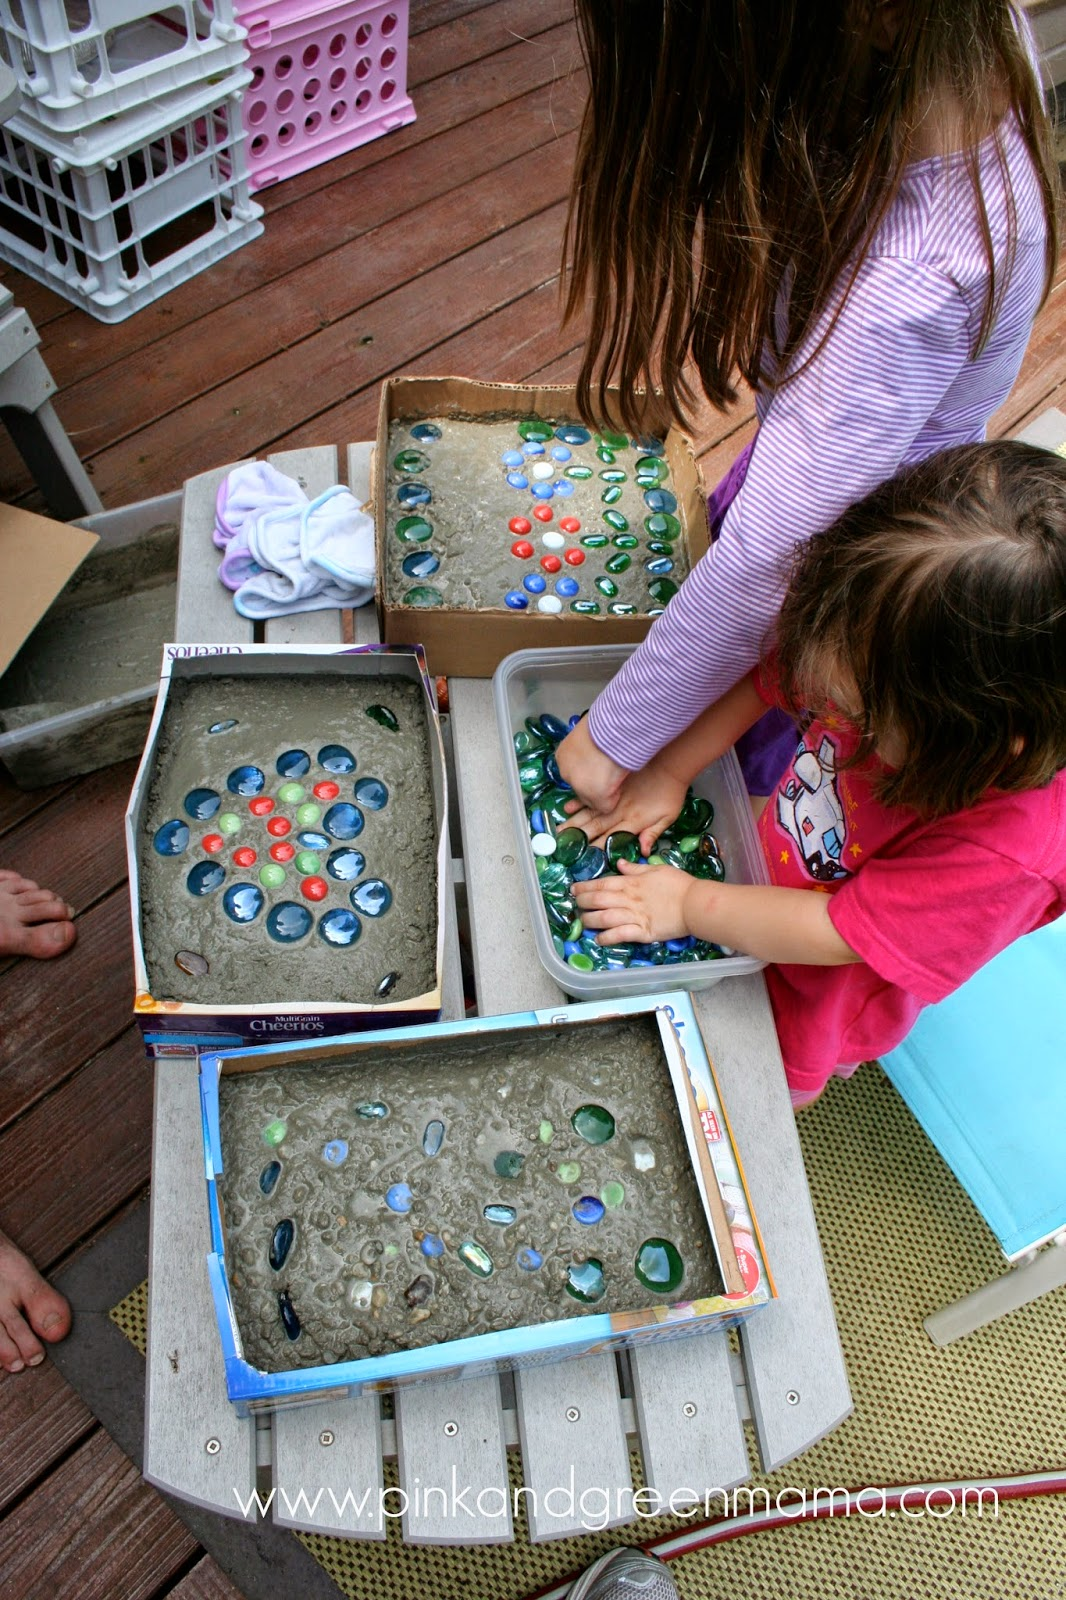 How To Make Decorative Stones